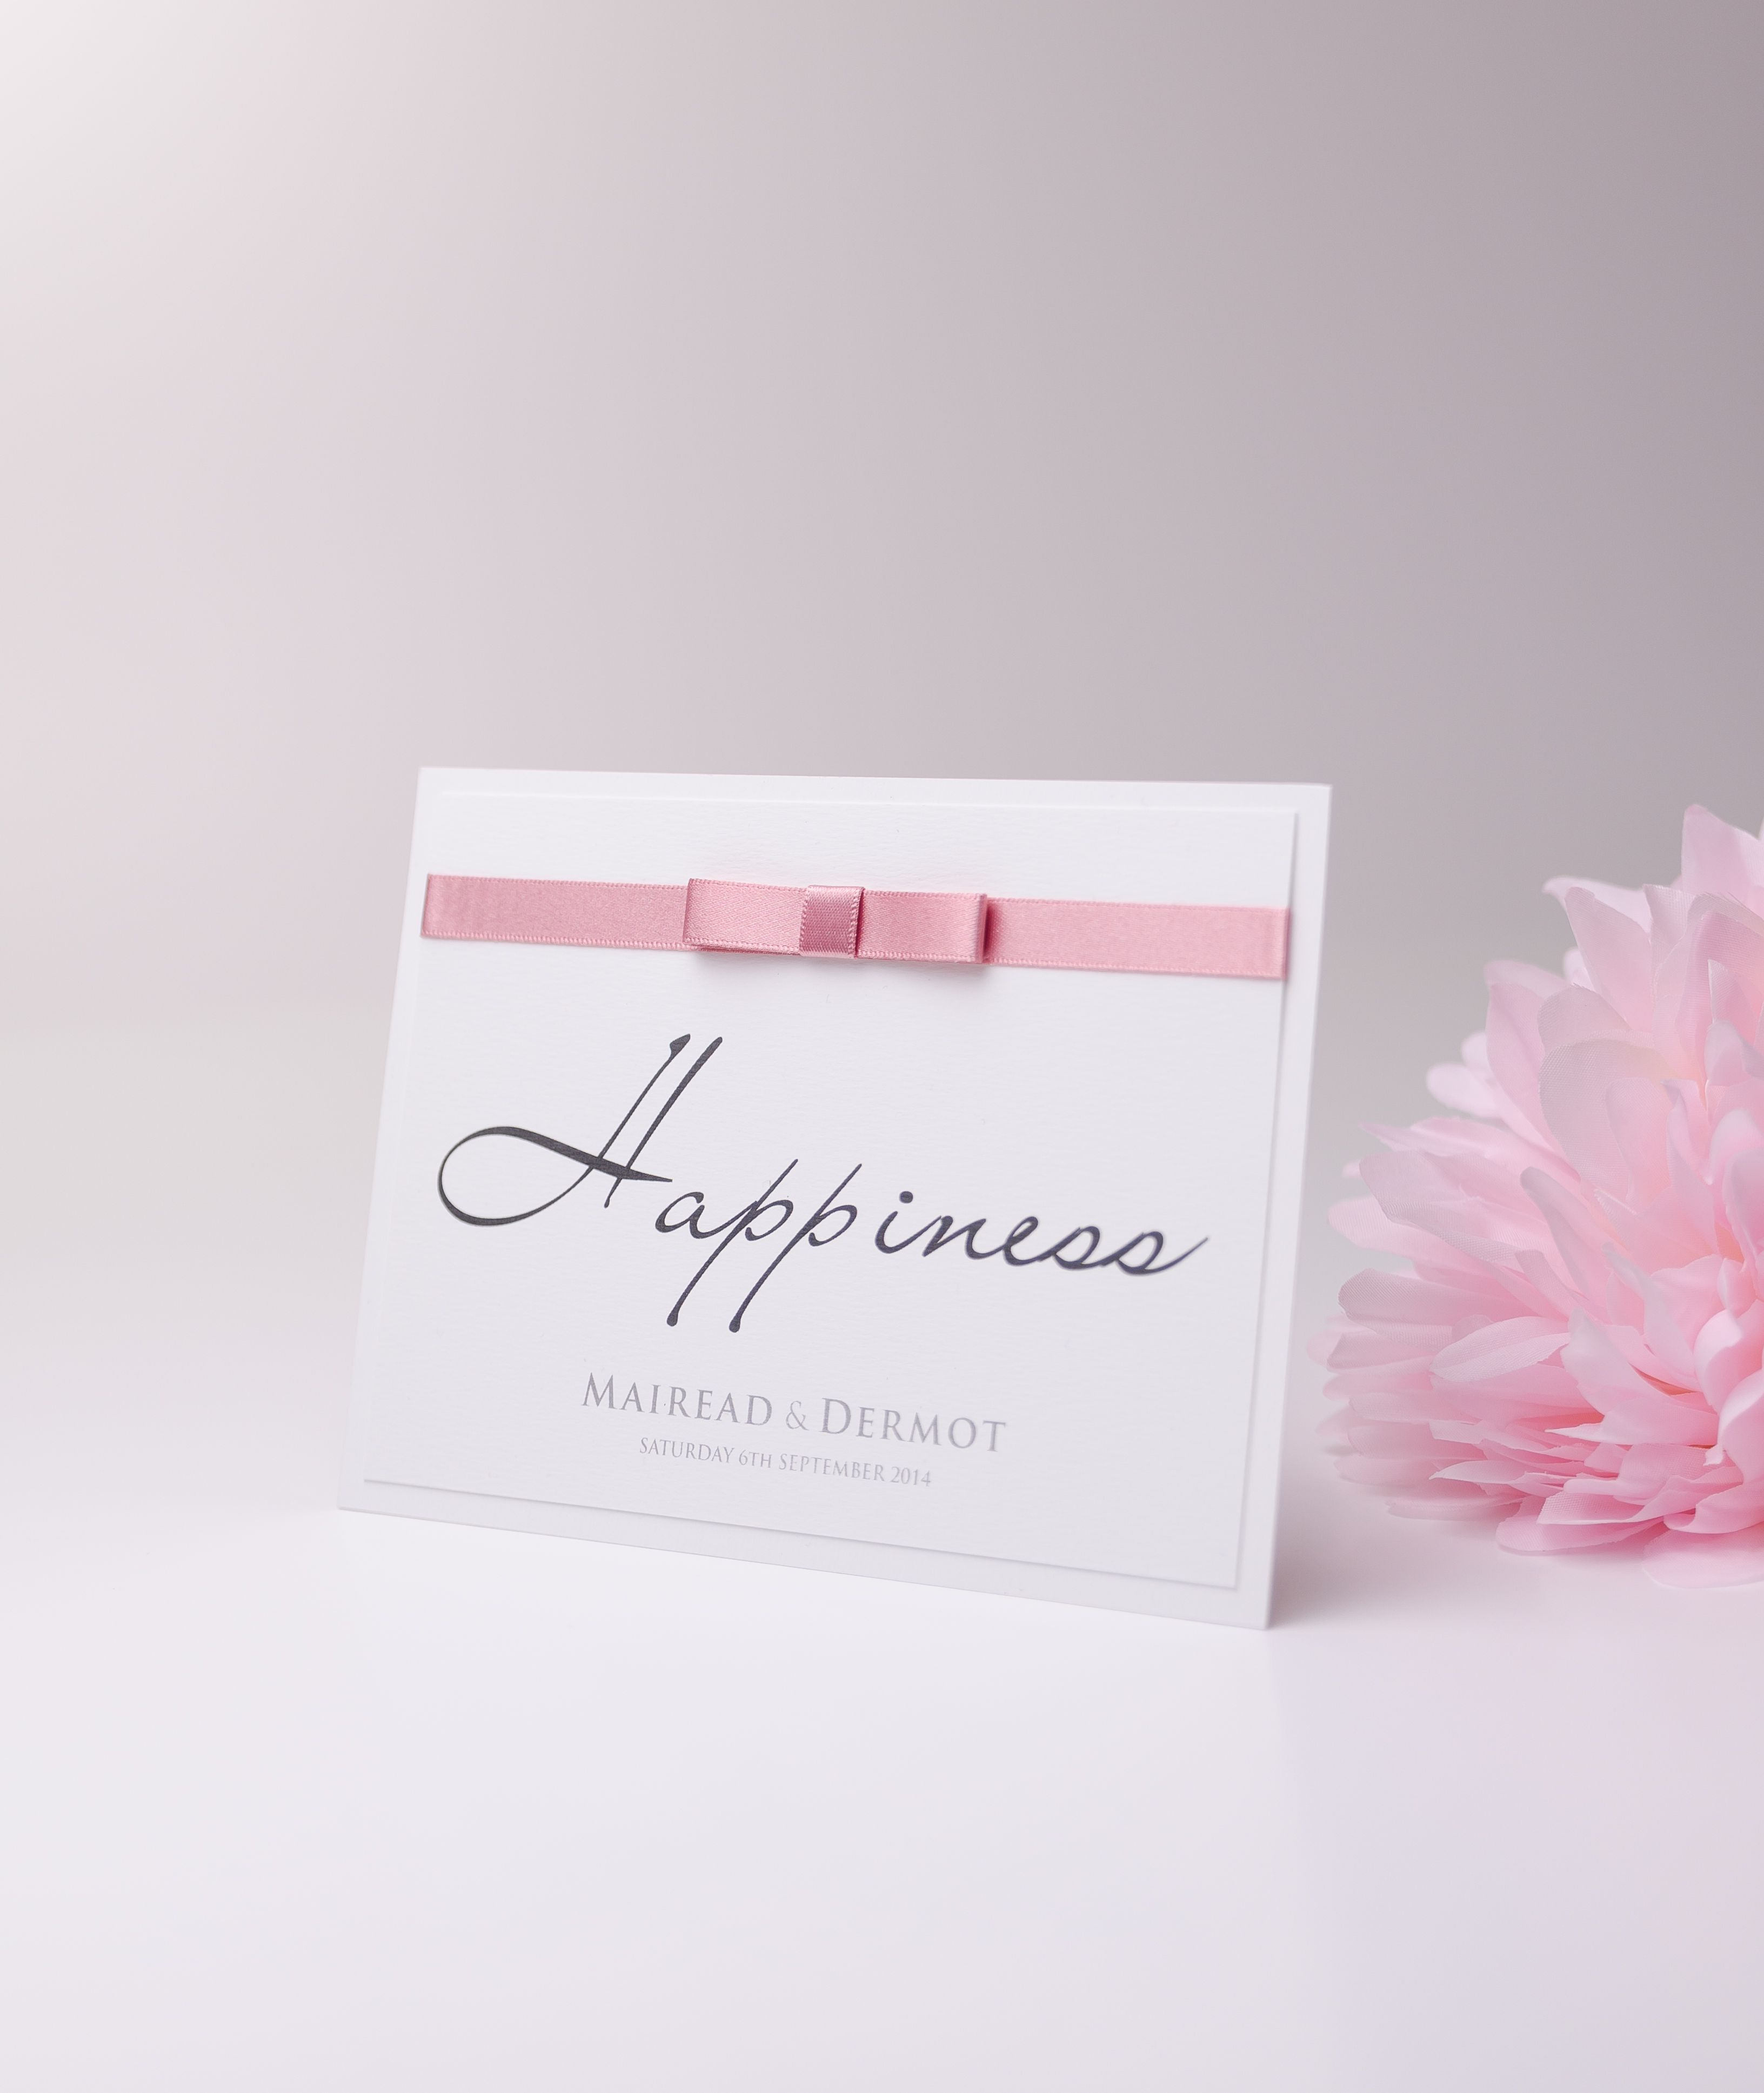 Wedding Table number/name #wedding #weddingplanner #weddingplanning #pinkribbon #bow #gettingmarried #handmade #weddingstationery